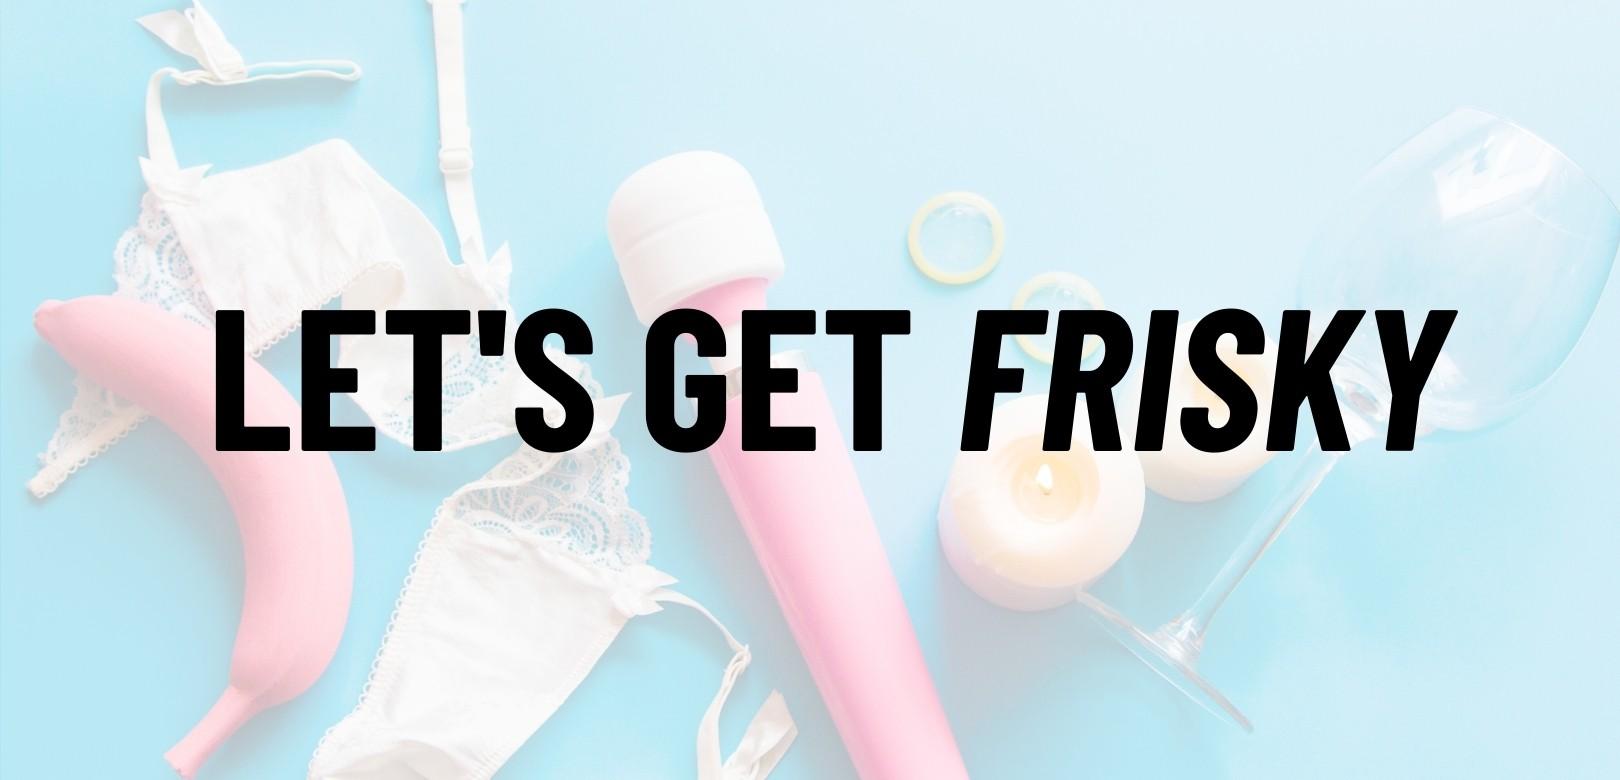 get frisky australia - vibrators and adult toys